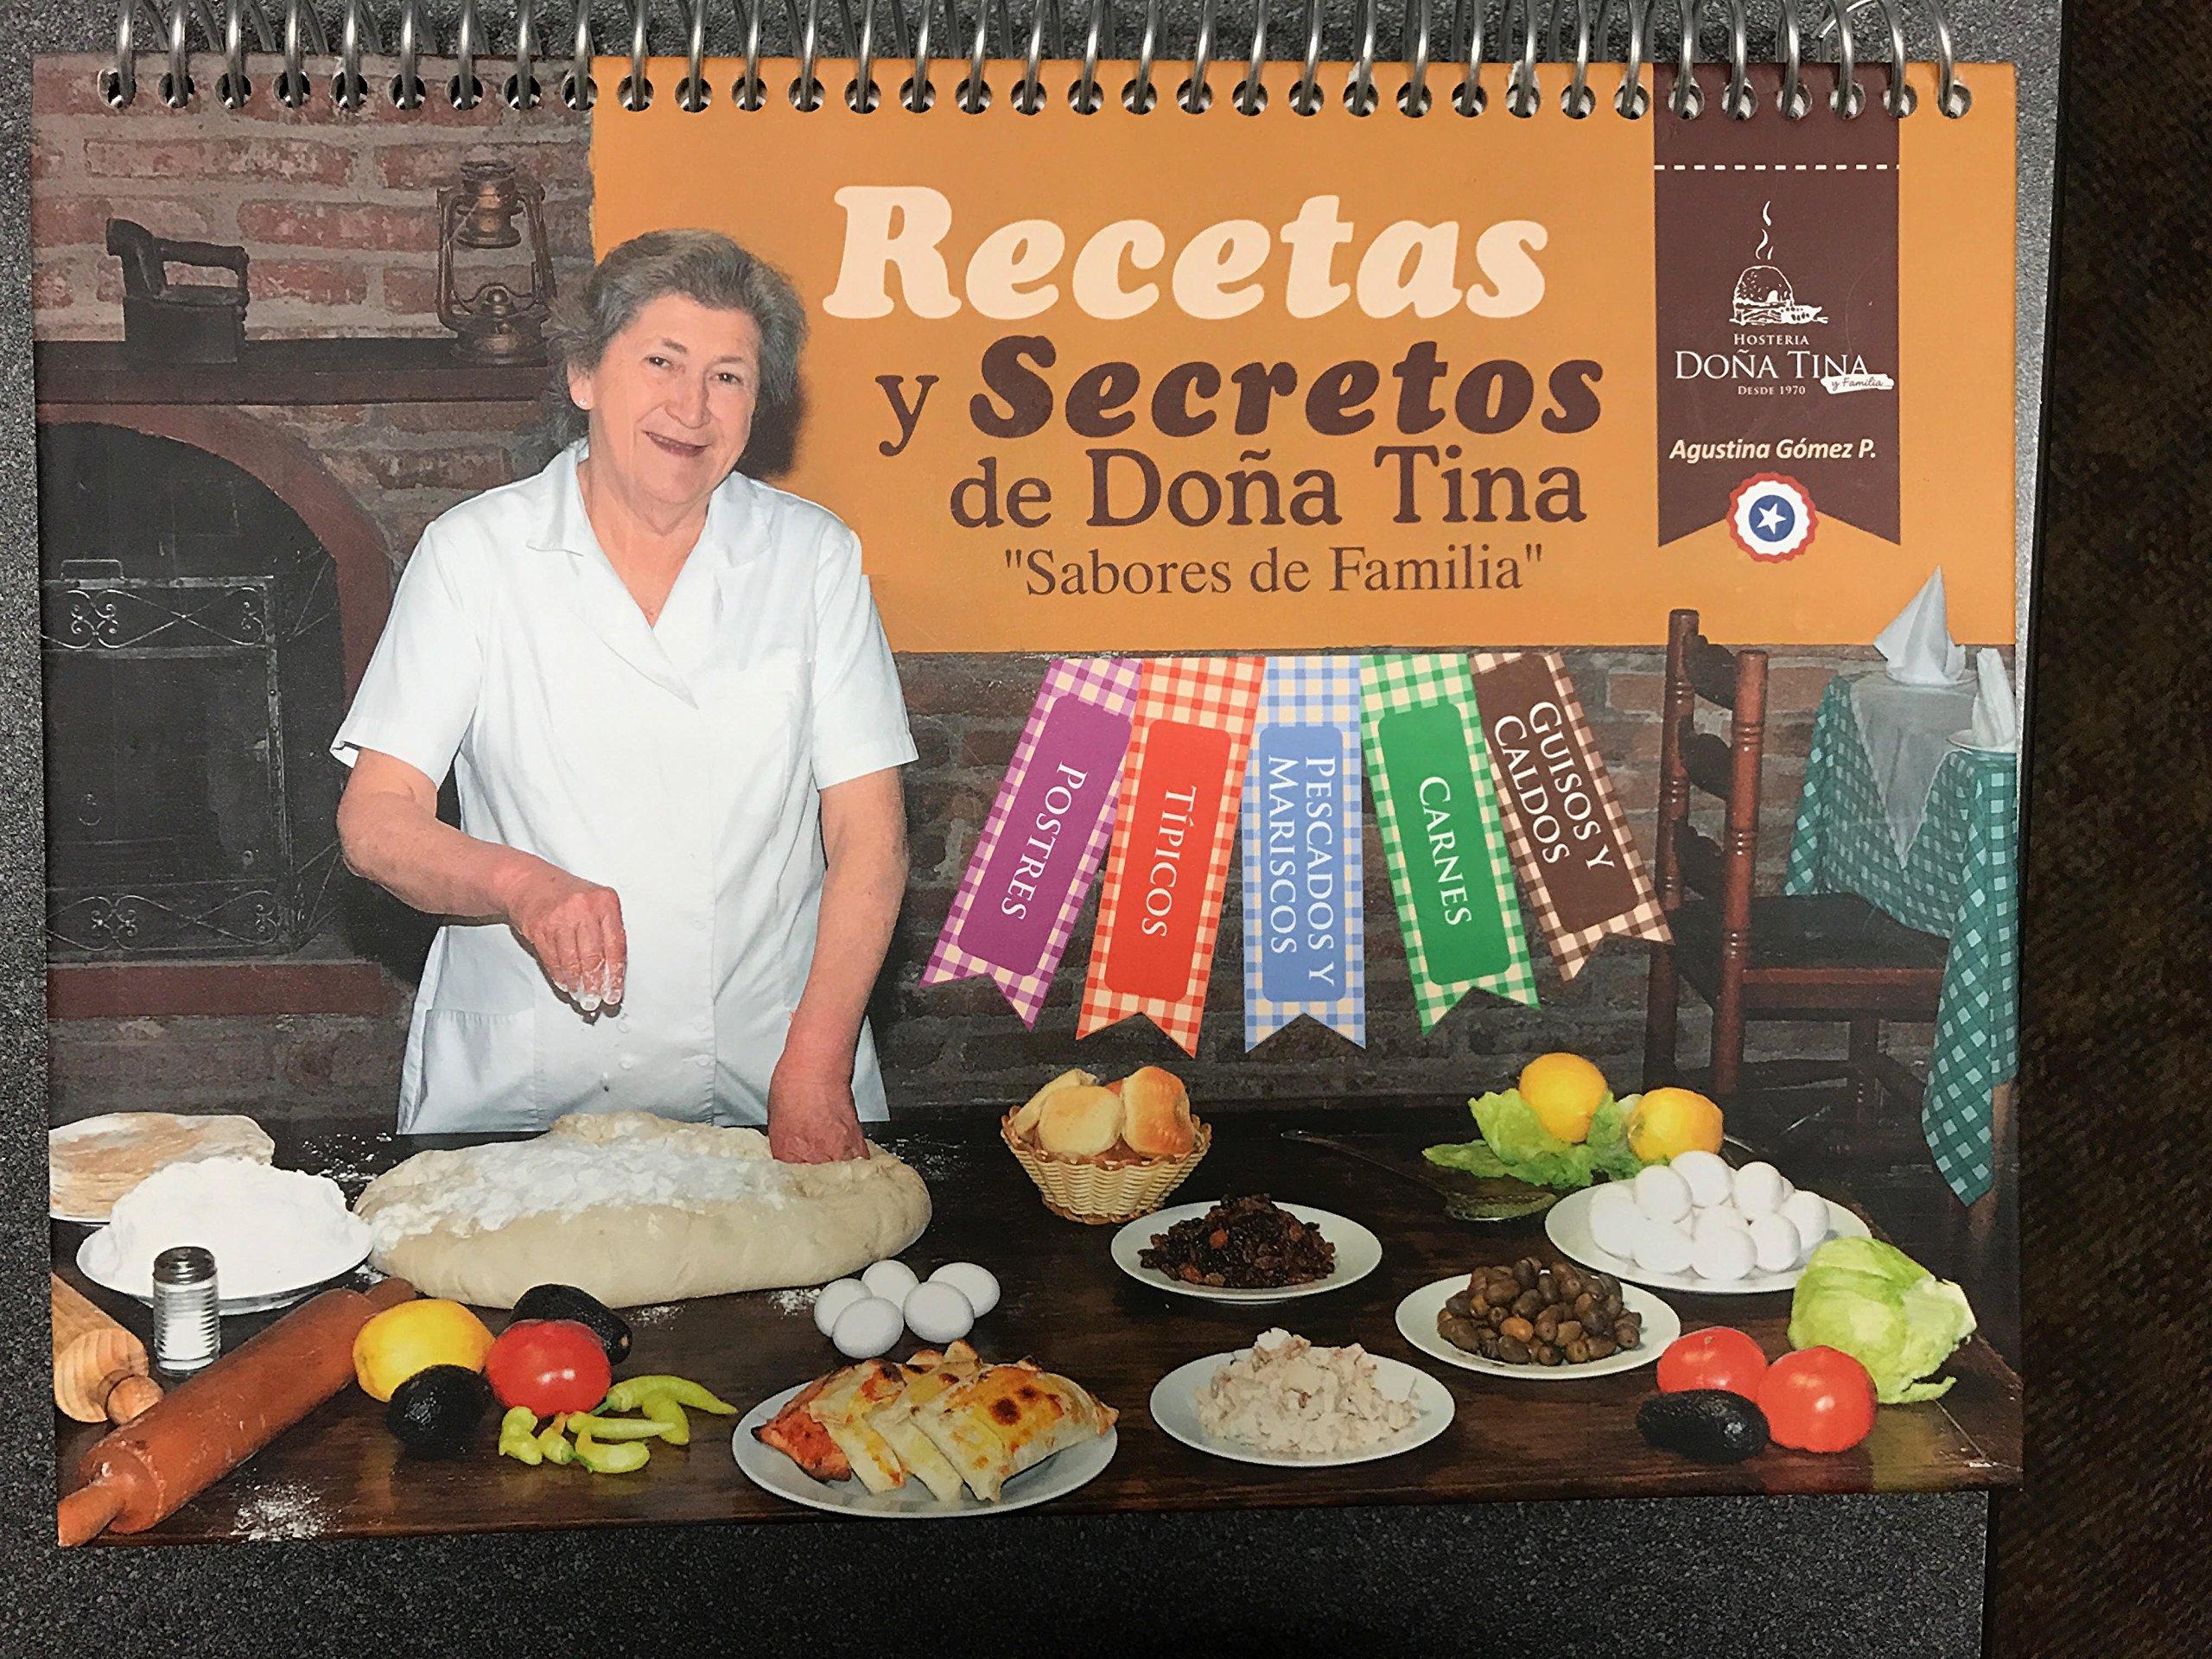 RECETAS Y SECRETOS DE DoñA Tina, SABORES DE FAMILIA DE CHILE: AUGUSTA GOMEZ PALMA: 0615435919072: Amazon.com: Books